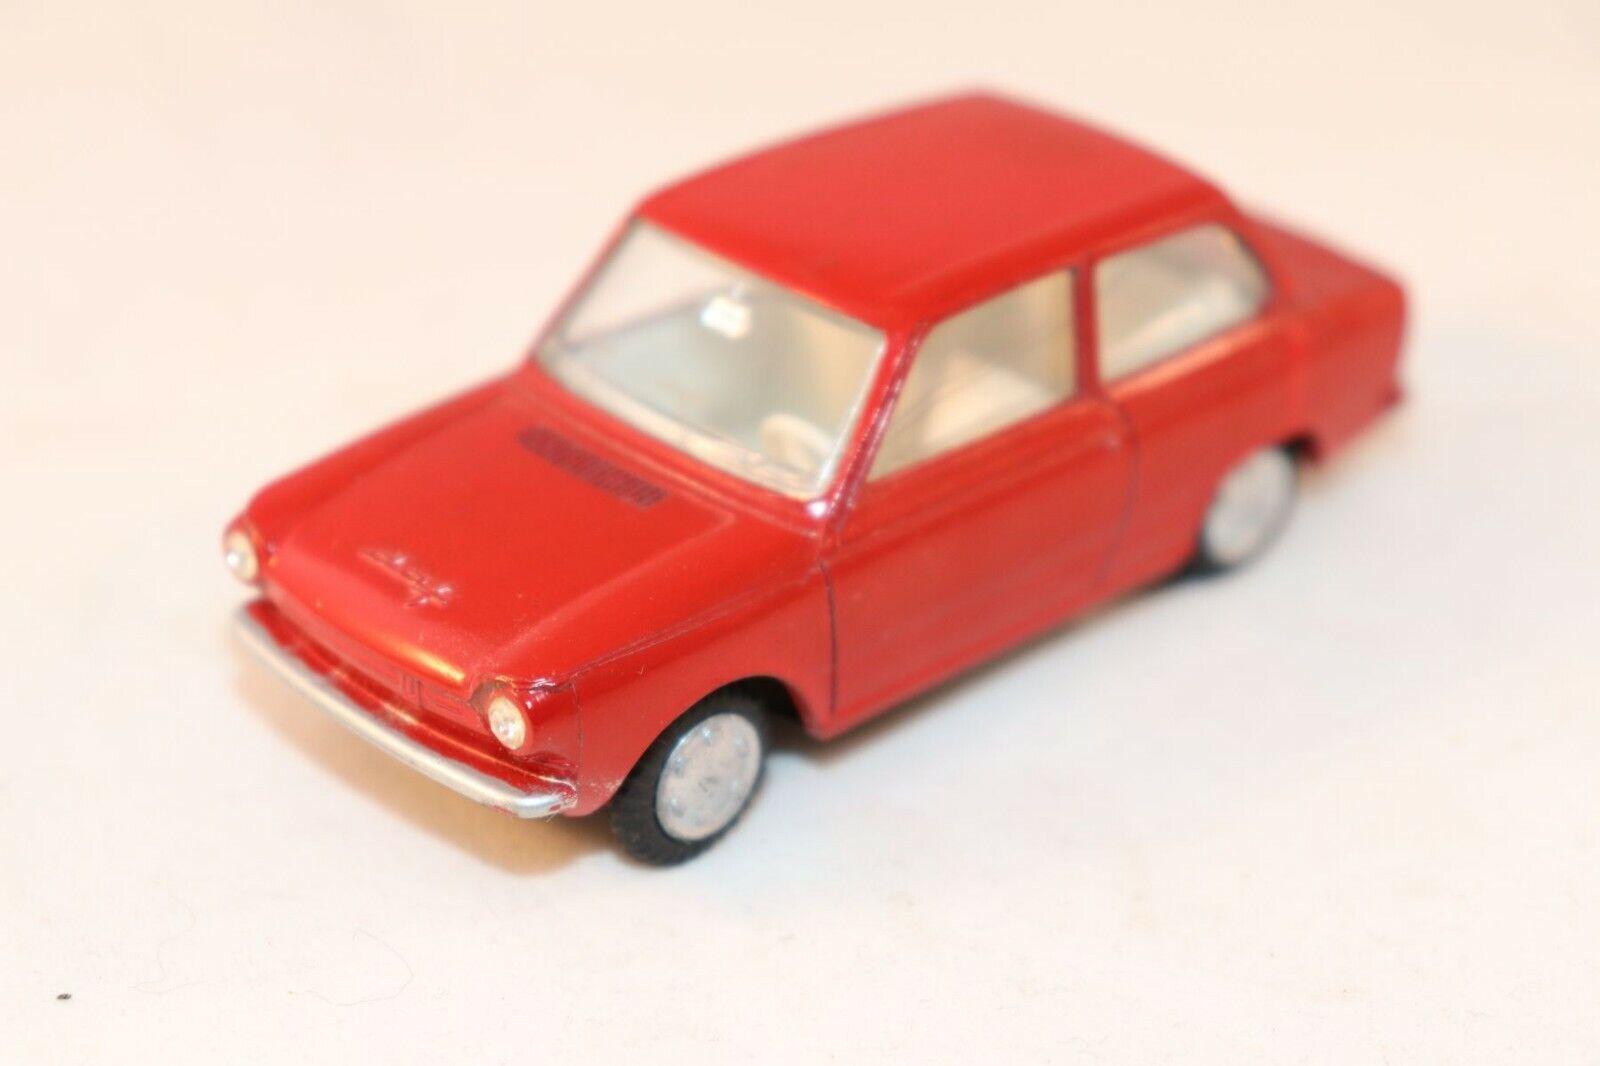 Lion voiture Daf 44 Variomatic  rouge in very very near mint all original condition  voici la dernière